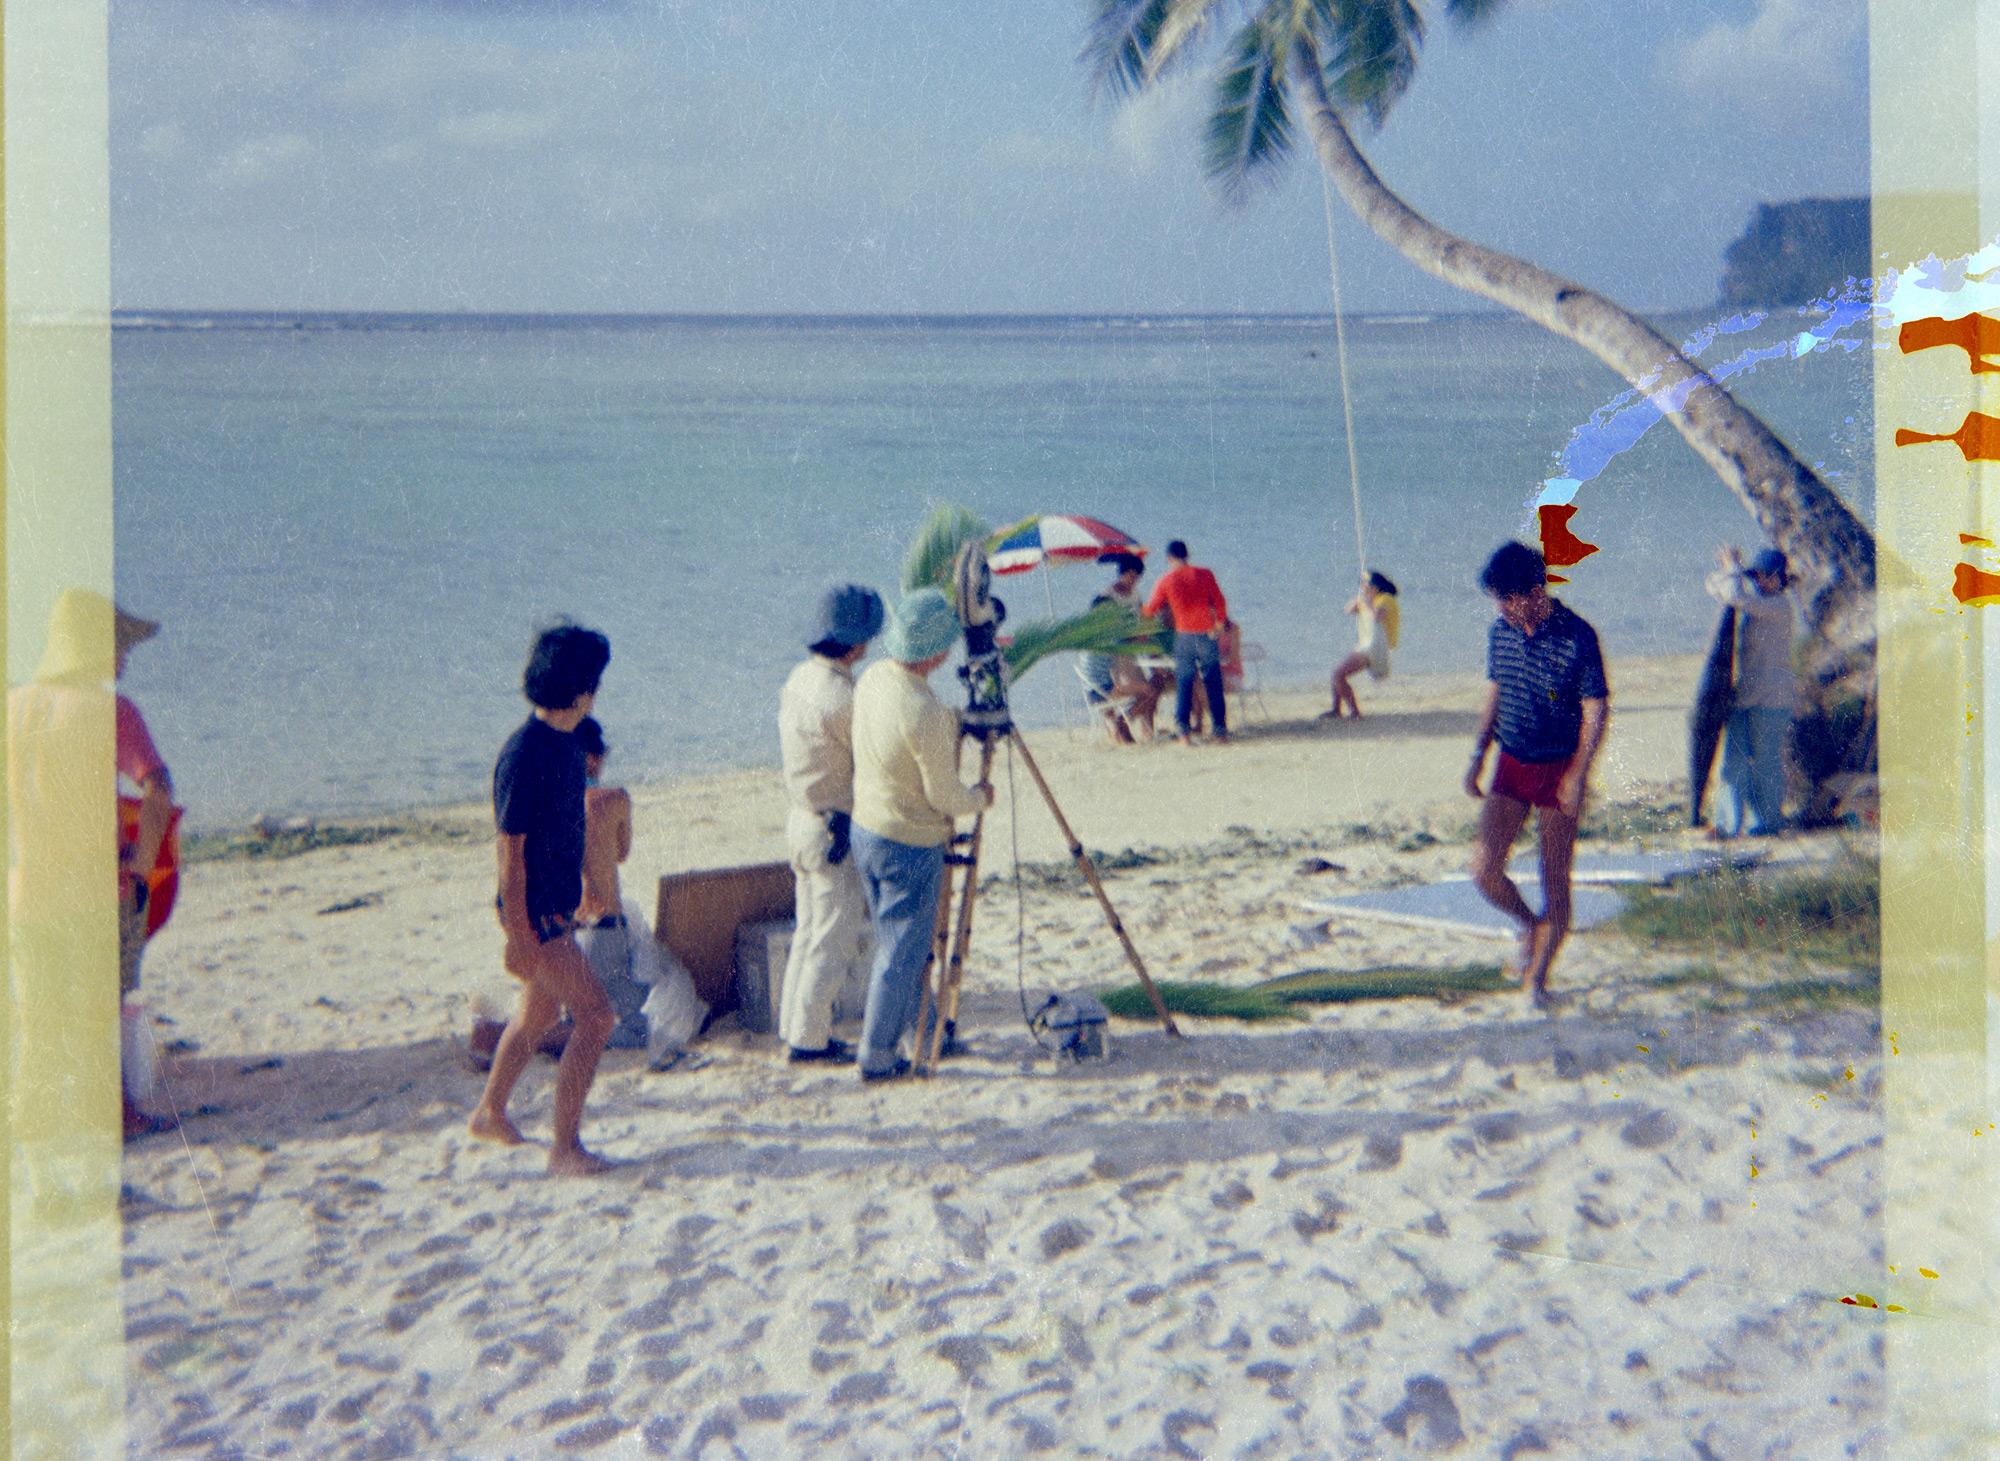 film-shoot-on-a-beach_ZC.jpg